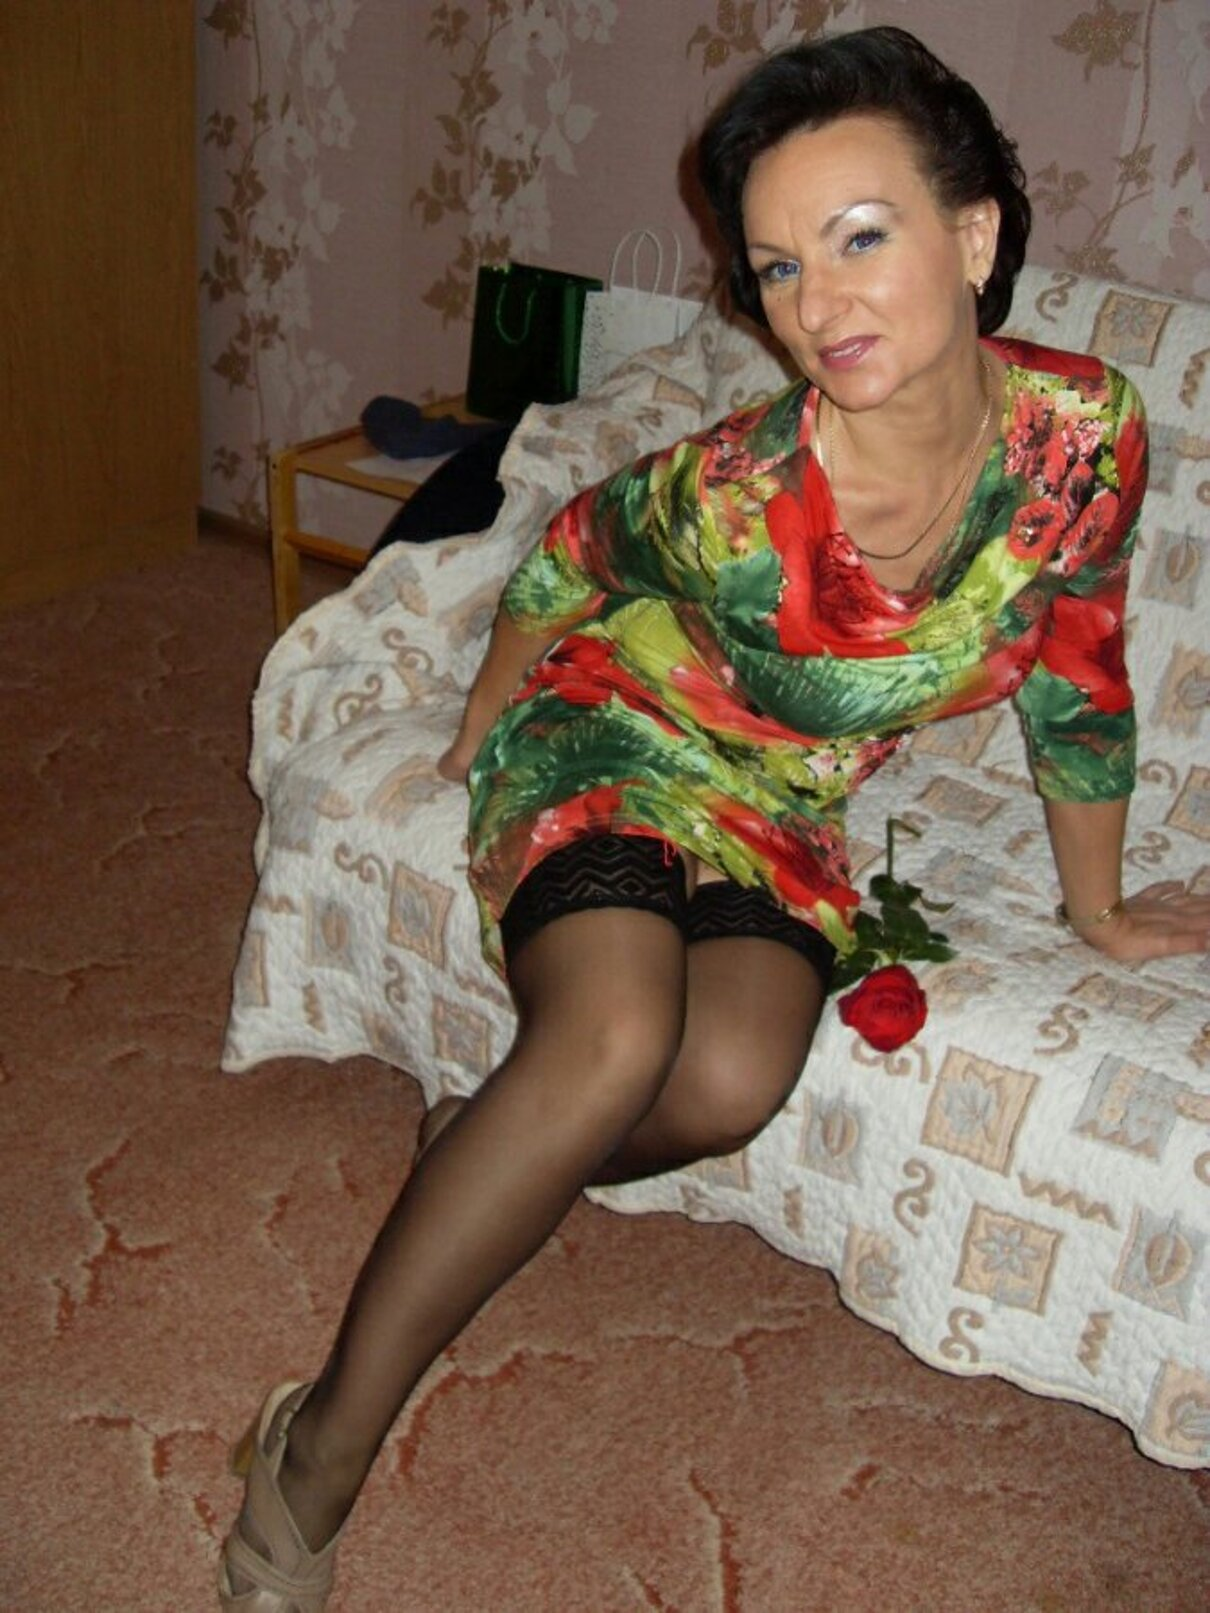 Жалоба-отзыв: Тимофеева Арина - Аферистка! Развратница! Разрушительница семей!.  Фото №1